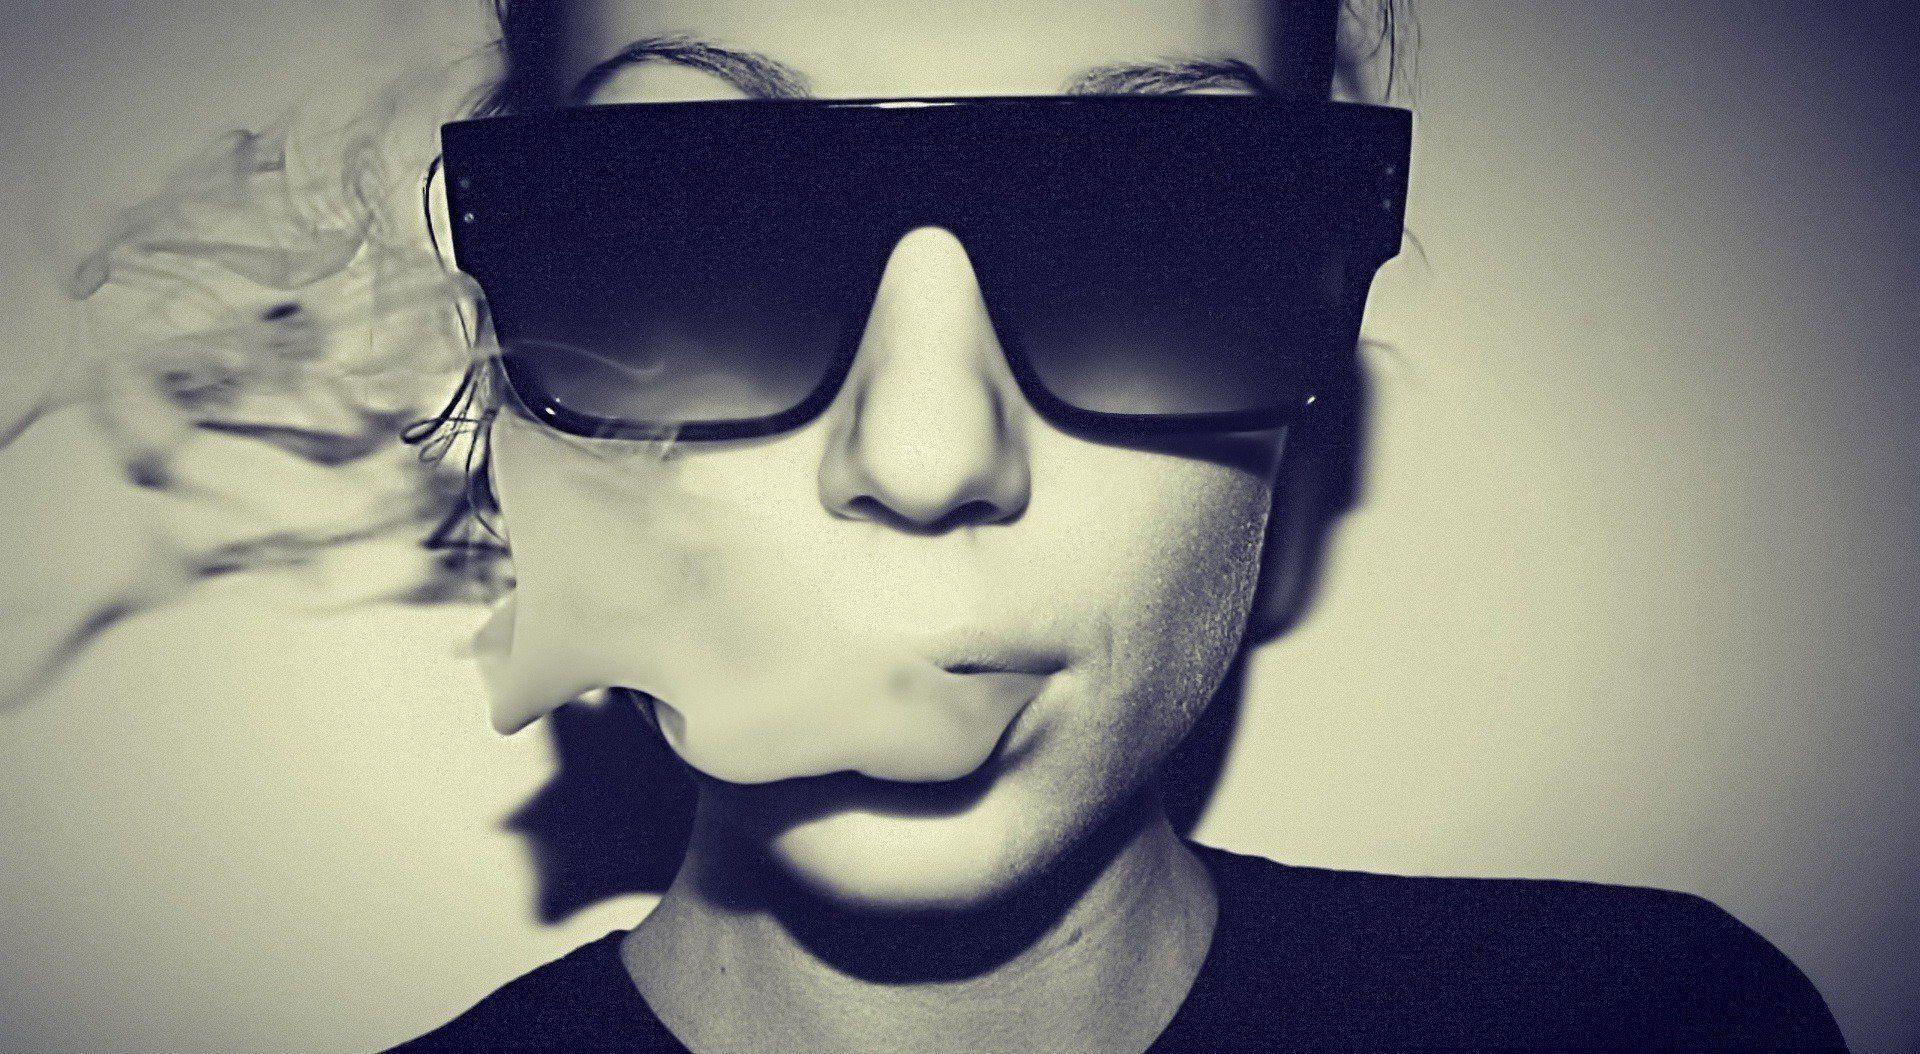 Women Glasses Smoke Swag Wallpaper - WallDevil